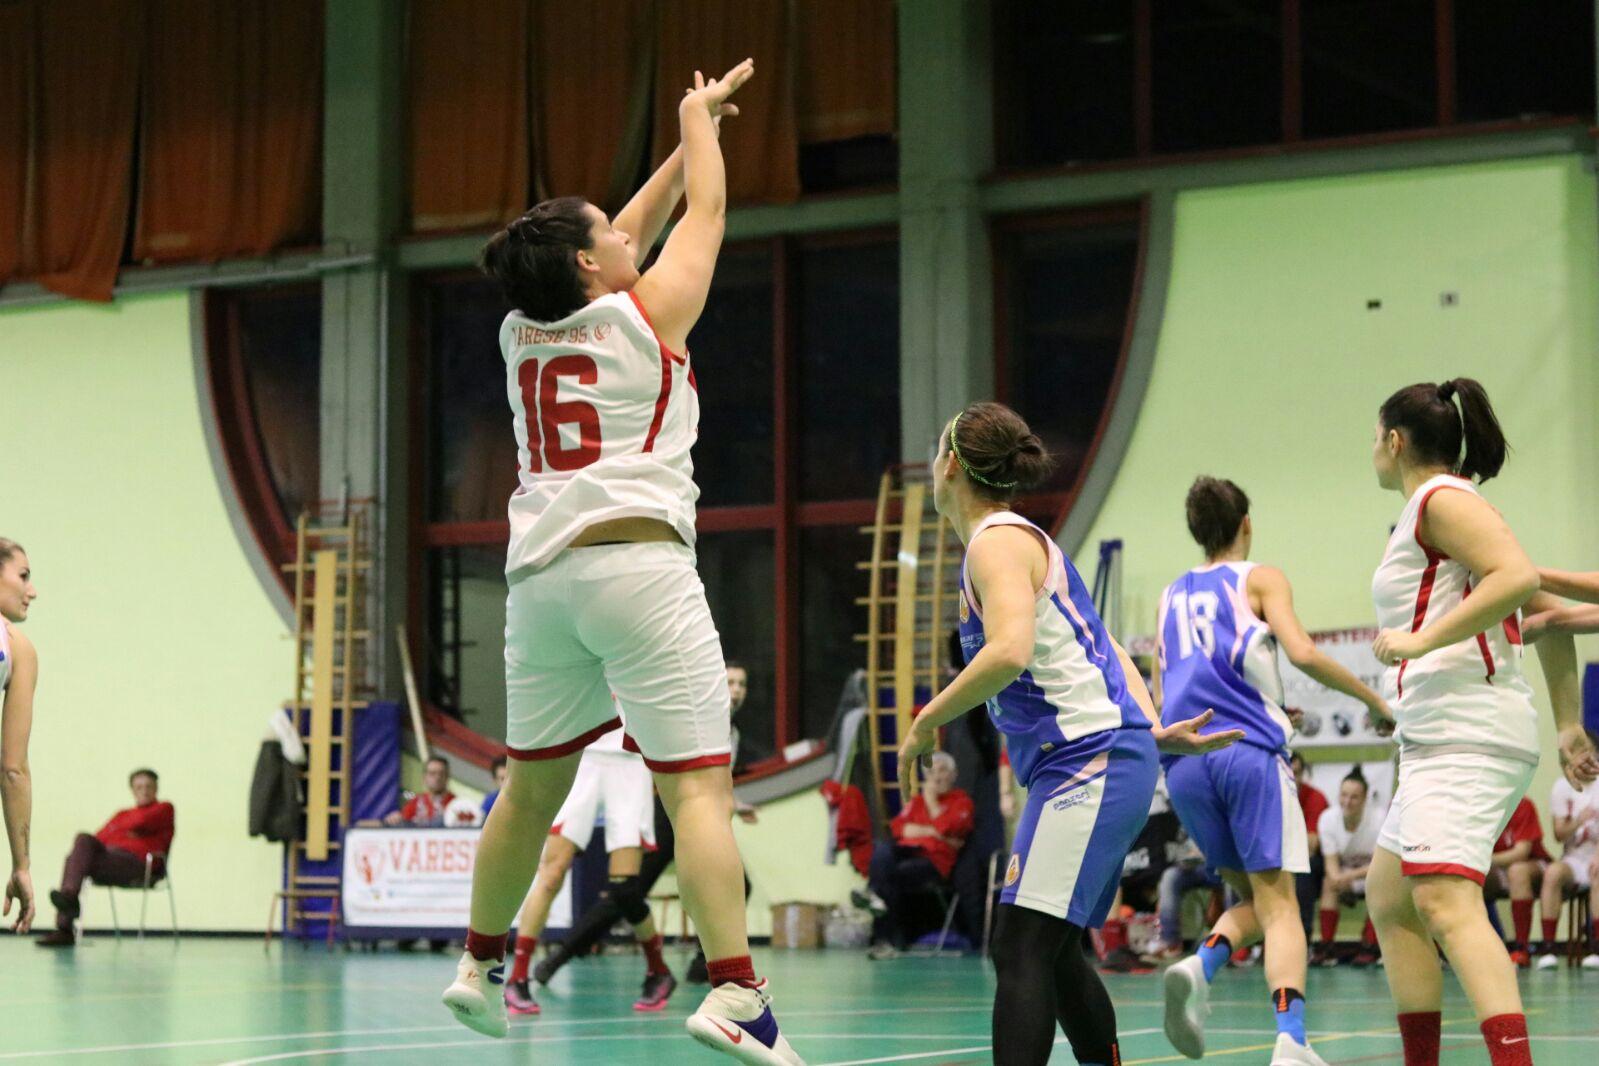 B femminile – Varese supera Valmadrera